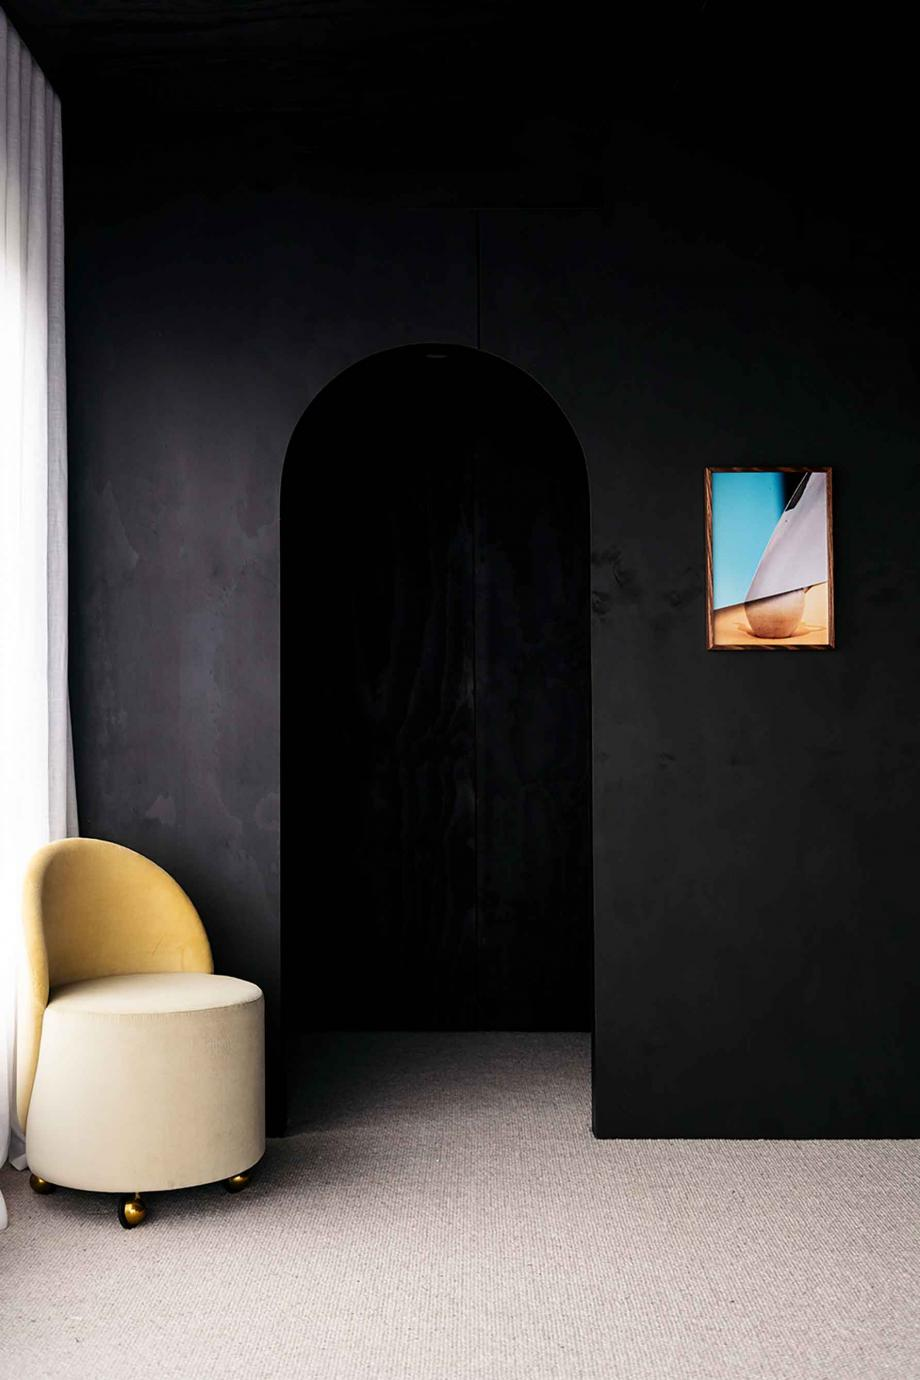 Slow Beam Hobart Tasmania Beams Luxury Accommodation Local Design